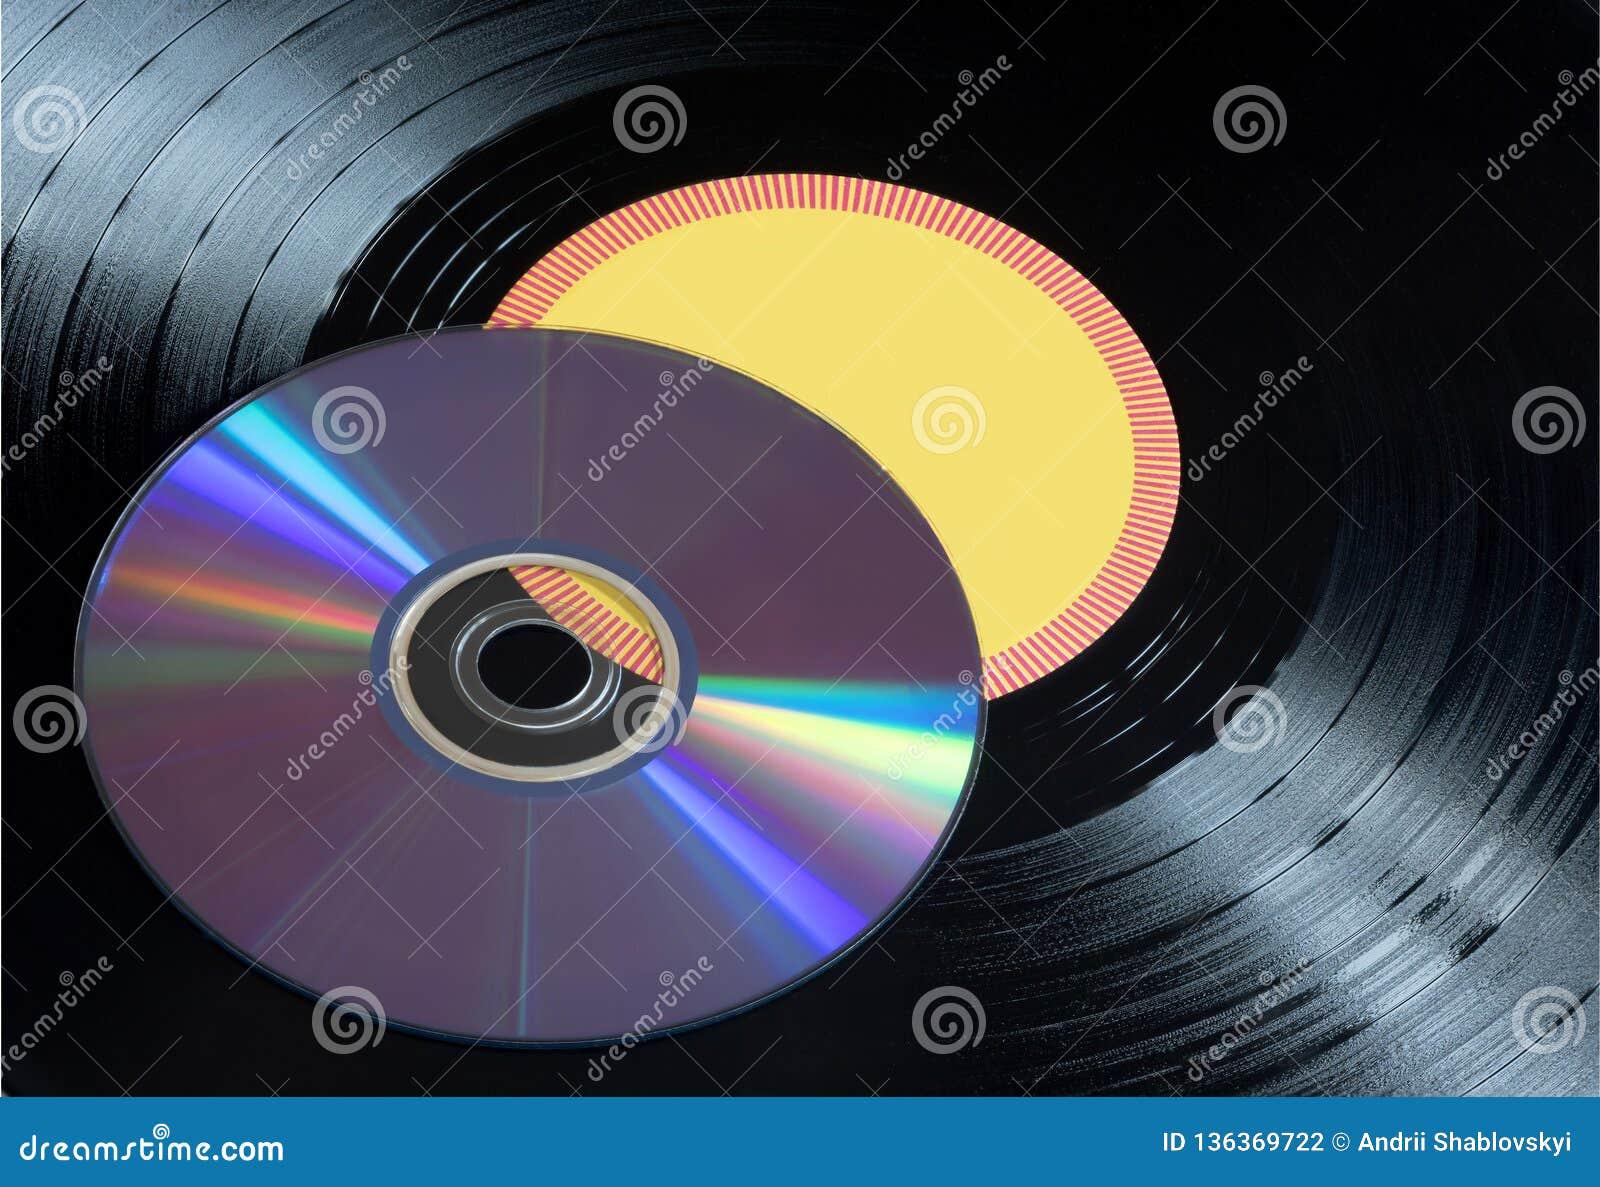 Vinyl records and CDs disks close up. Musical disks.